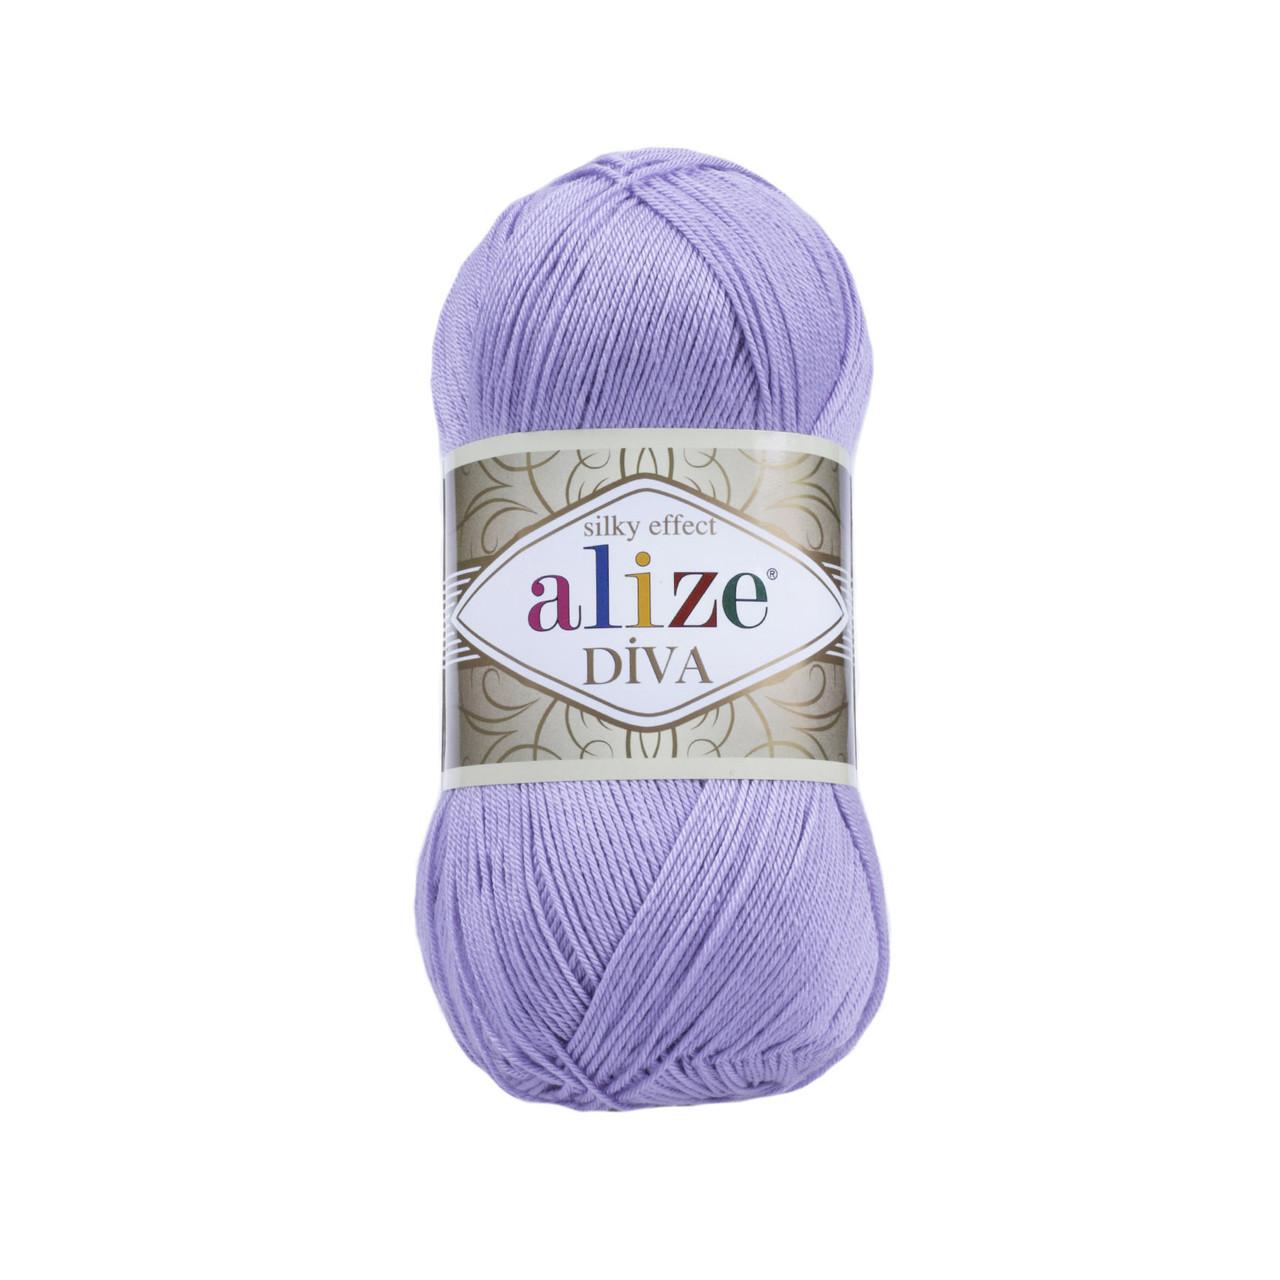 Пряжа Ализе Дива Alize Diva, цвет №158 лавандовый